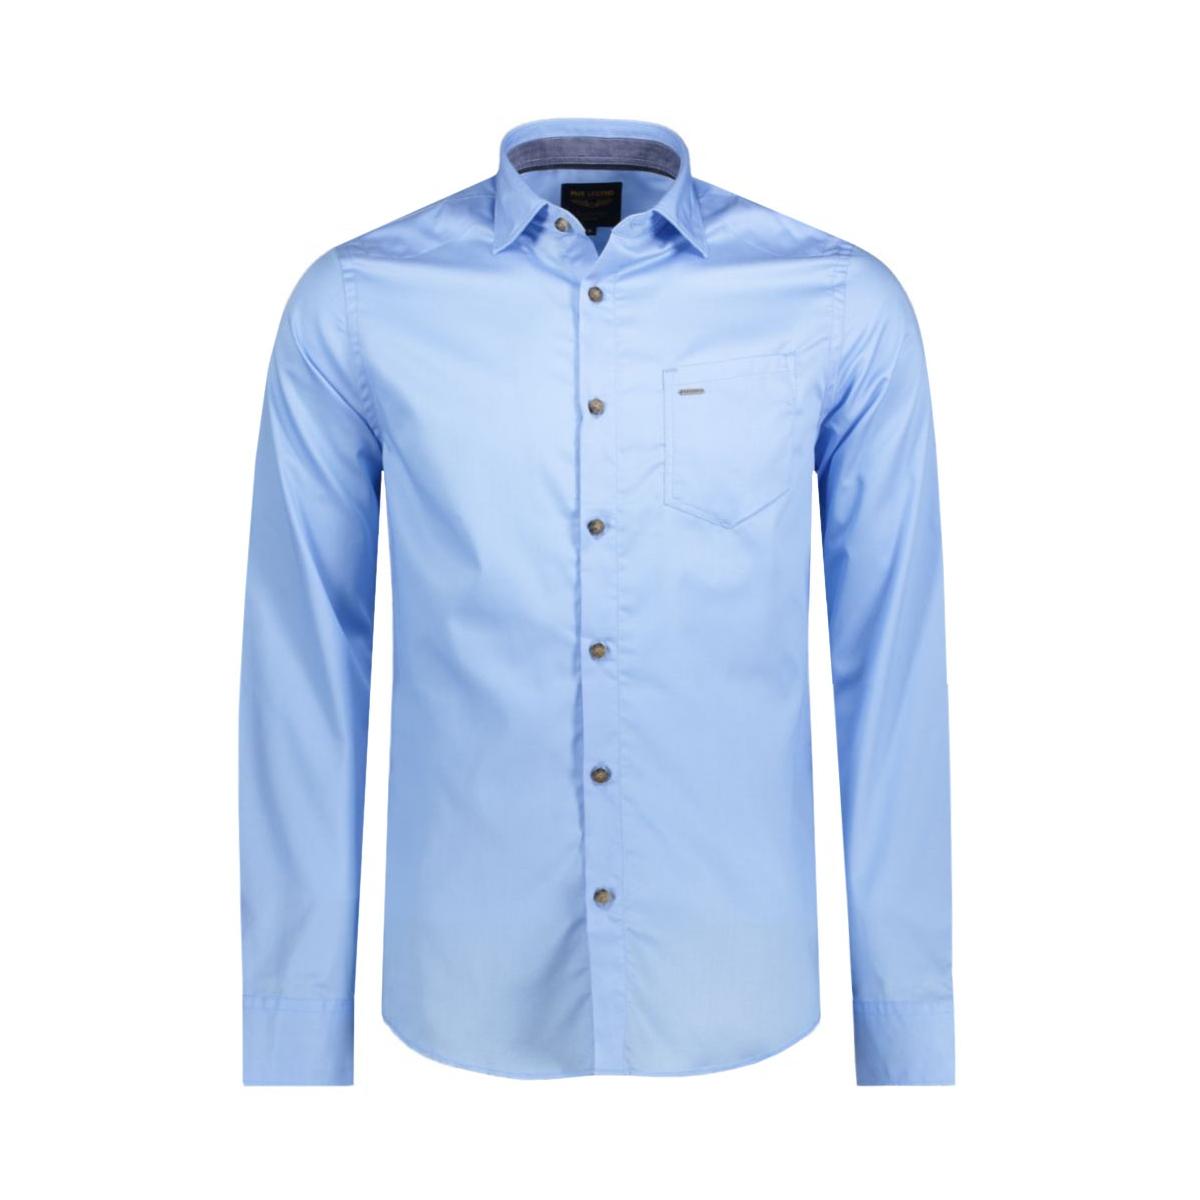 psi67290 pme legend overhemd 547